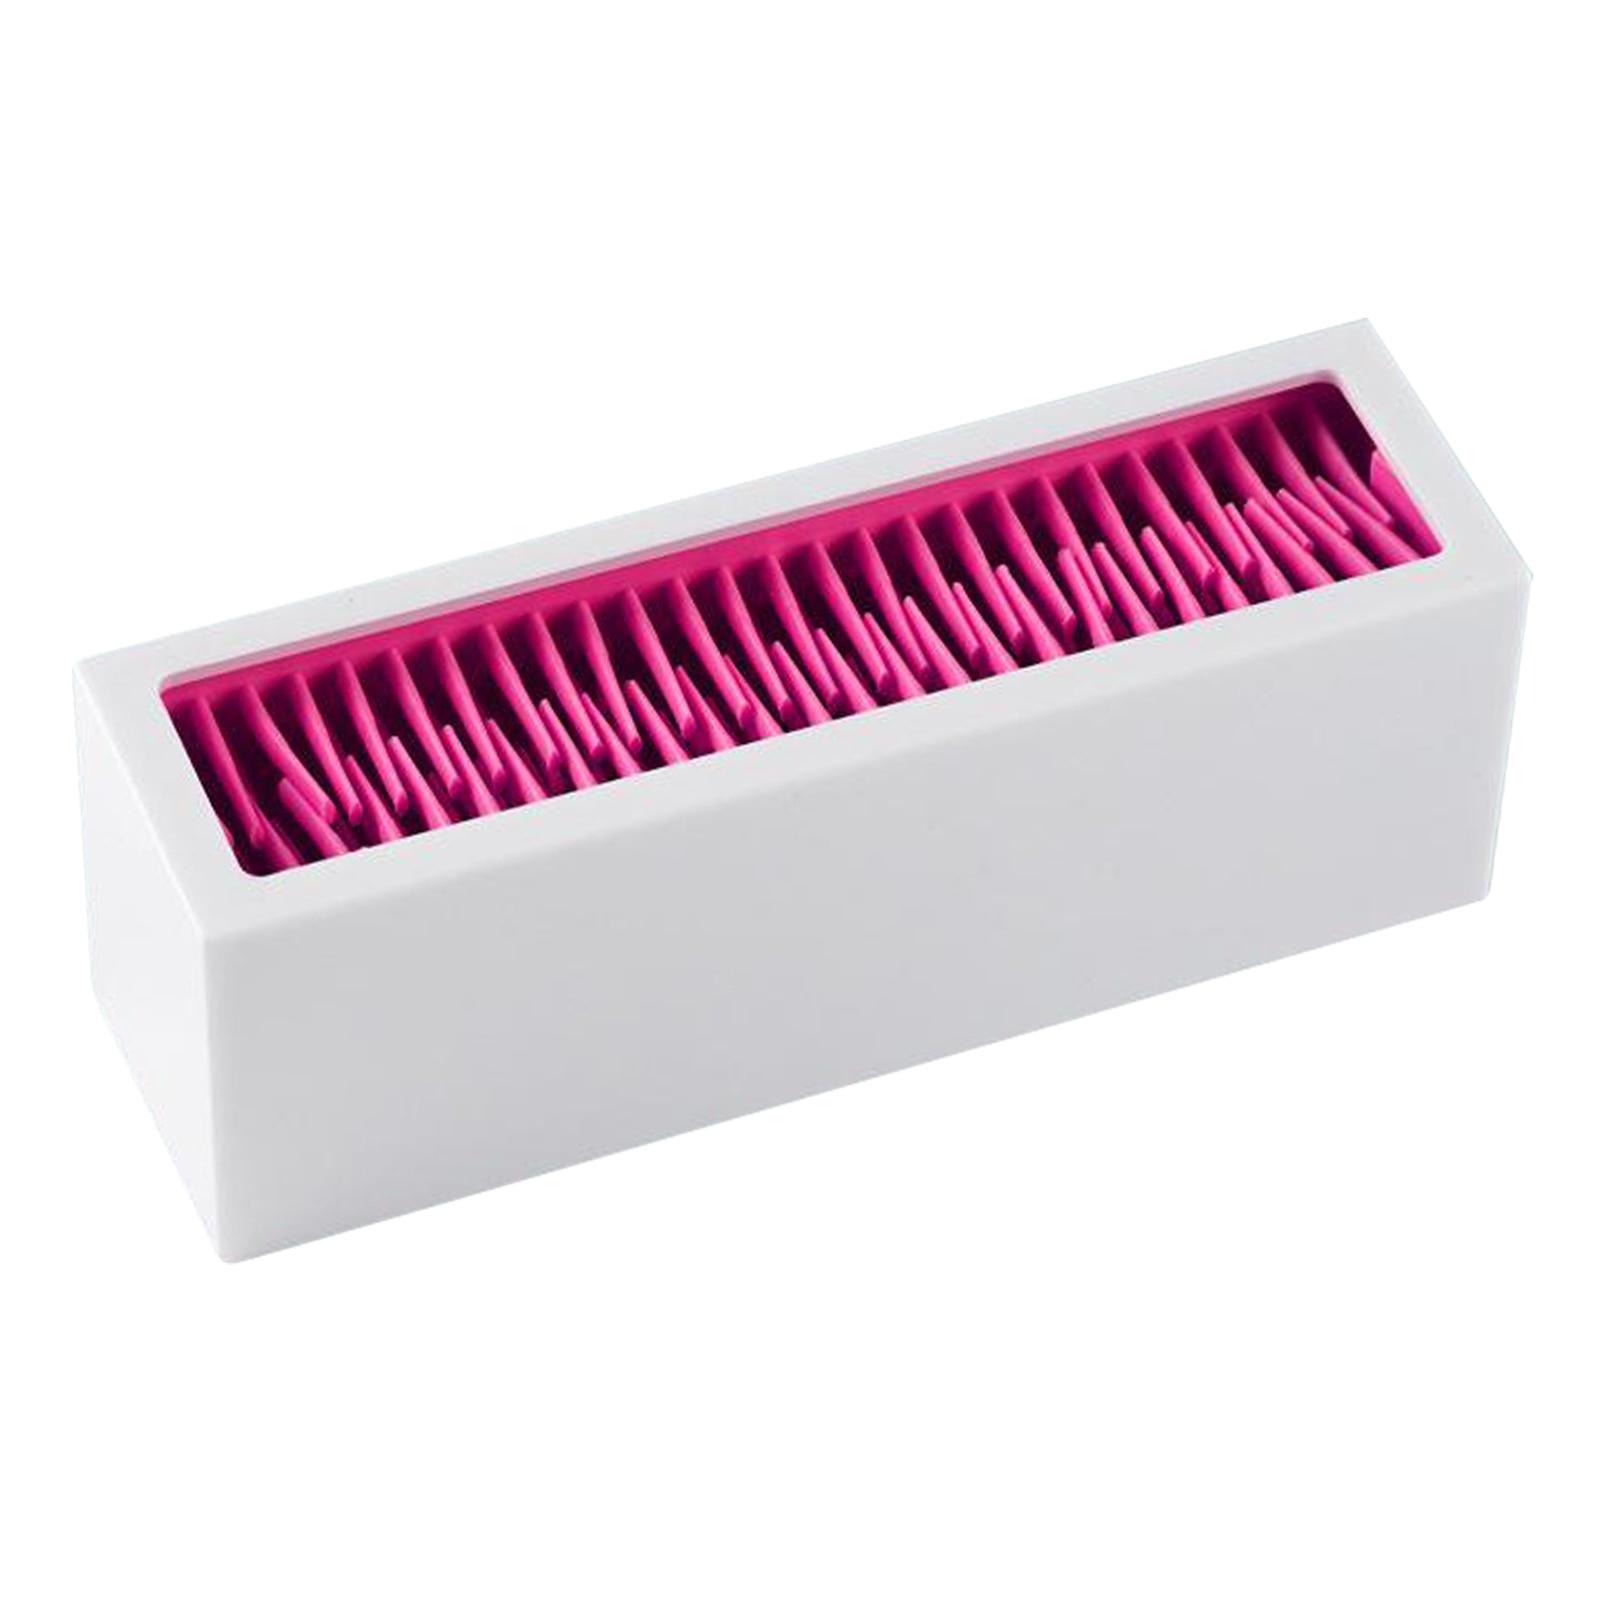 Makeup Brush Organizer Silicone Cosmetic Tools Storage Holder Vanity Display